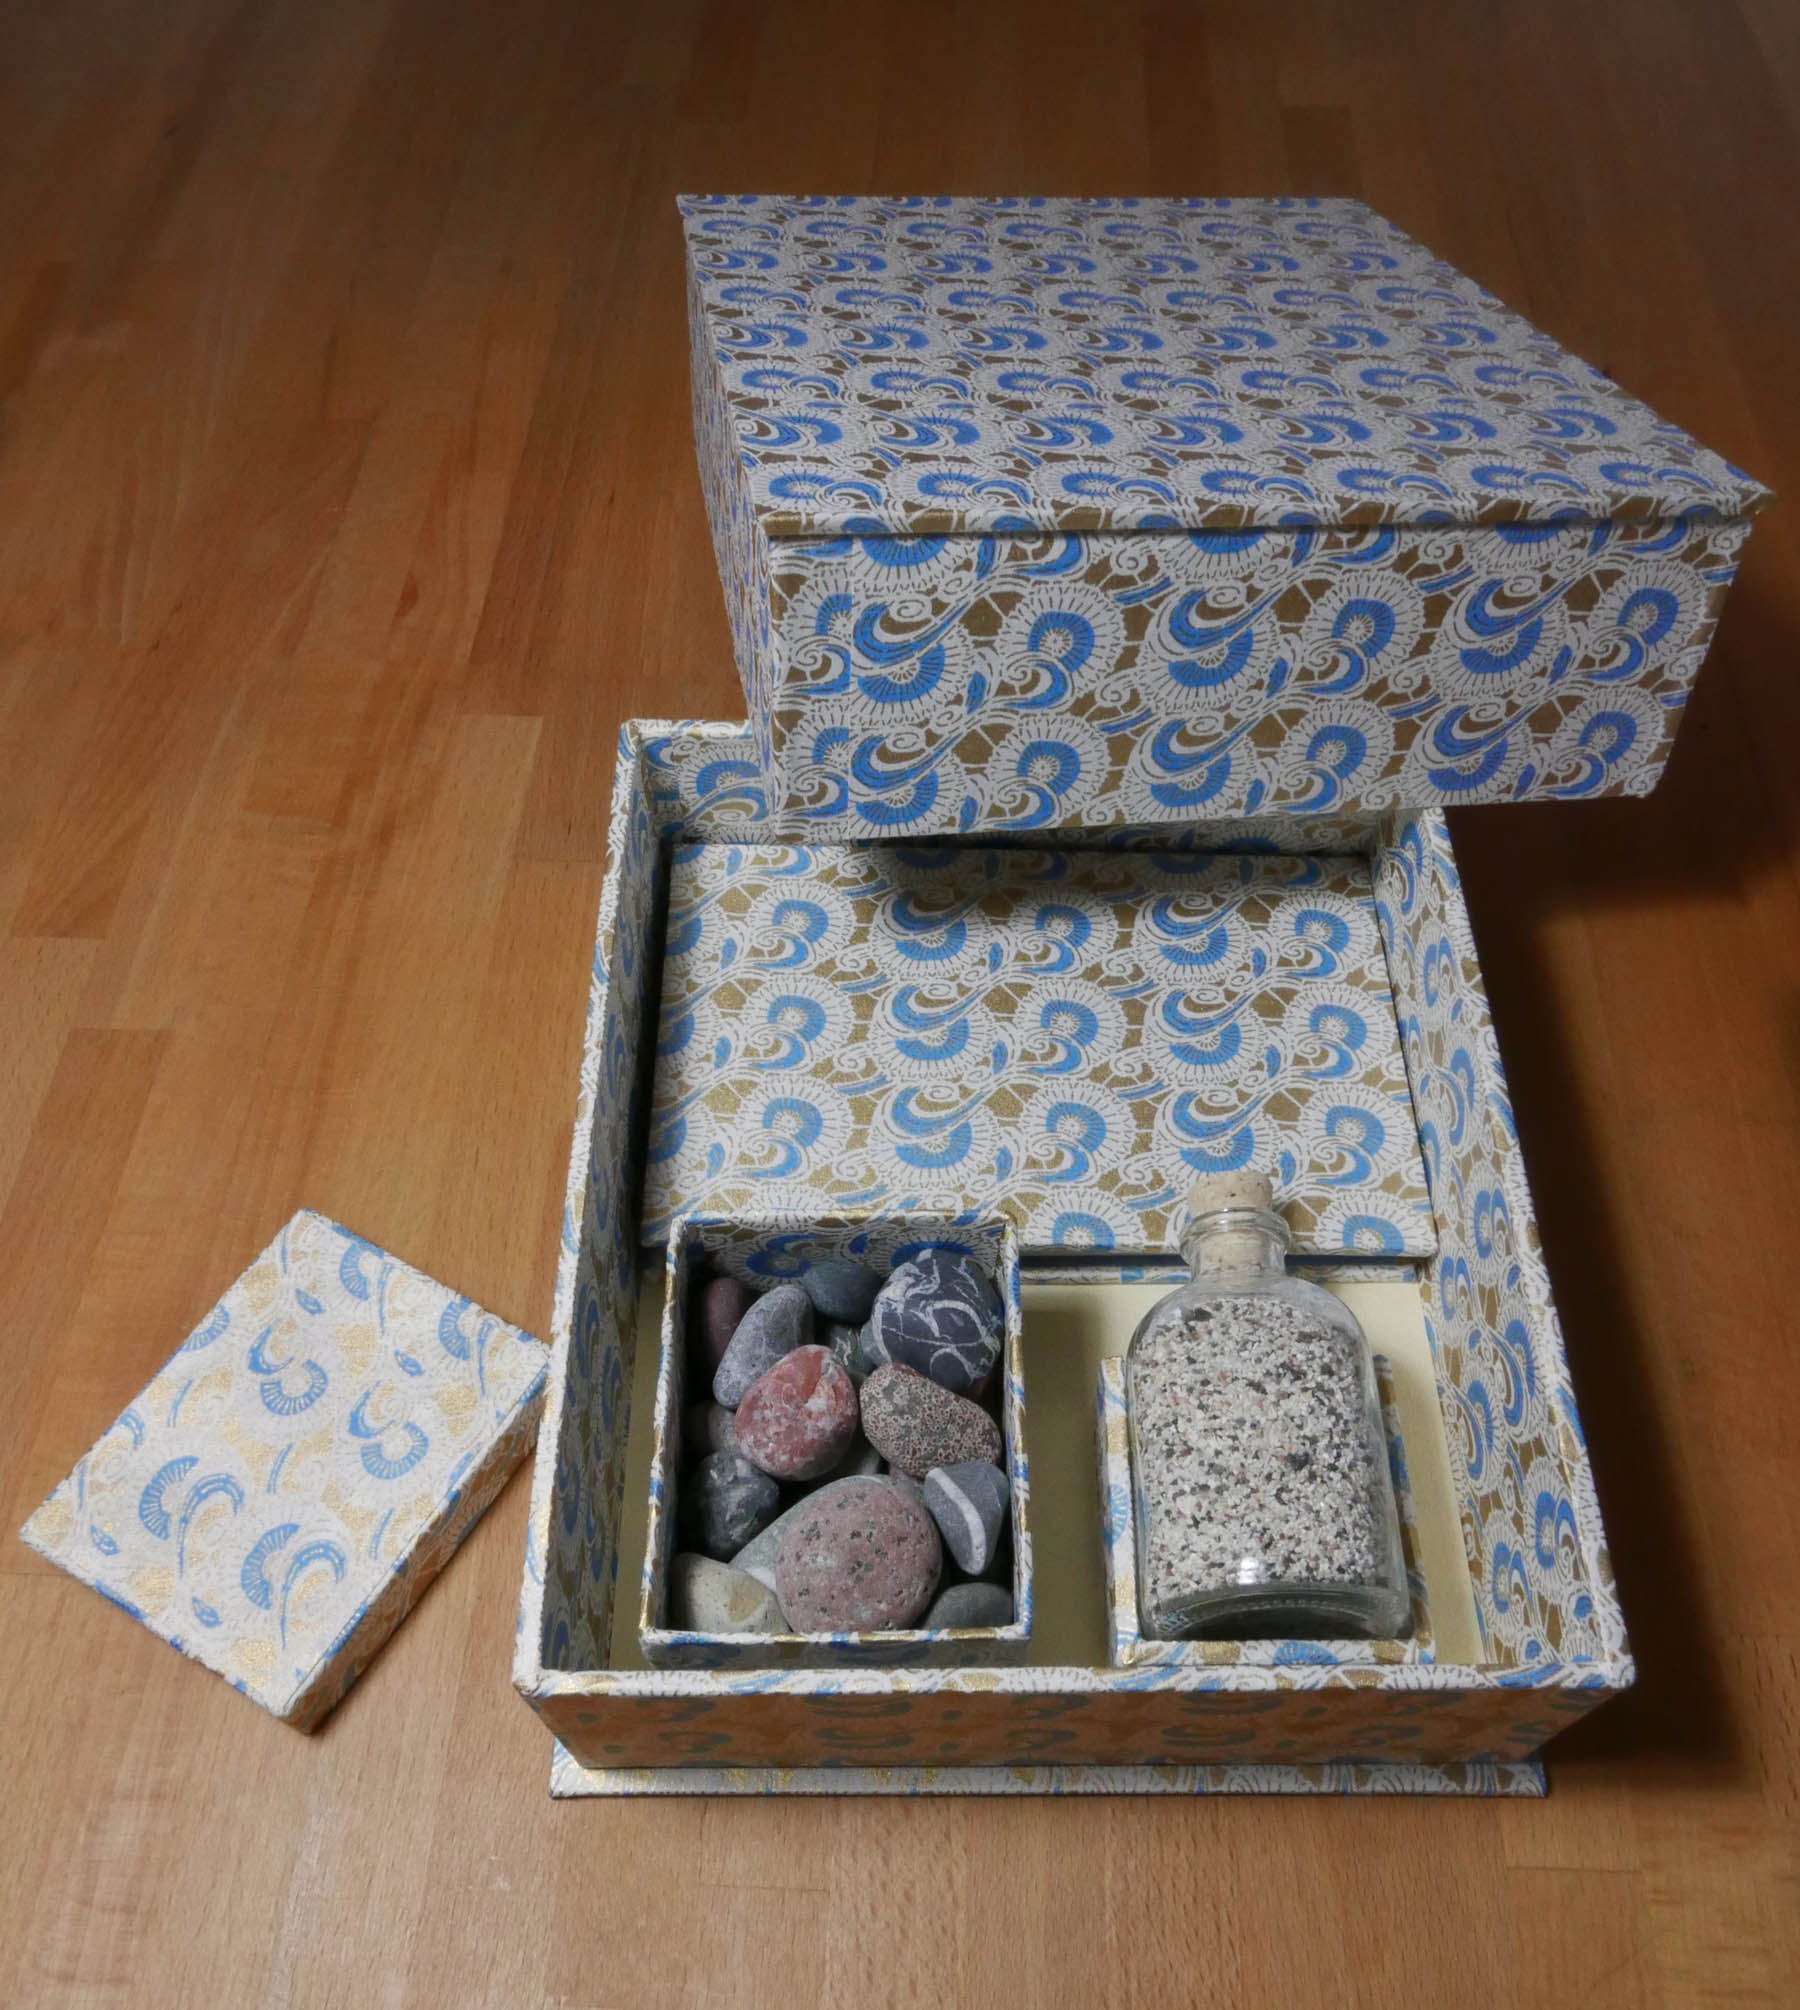 Hough Bay custom made presentation box